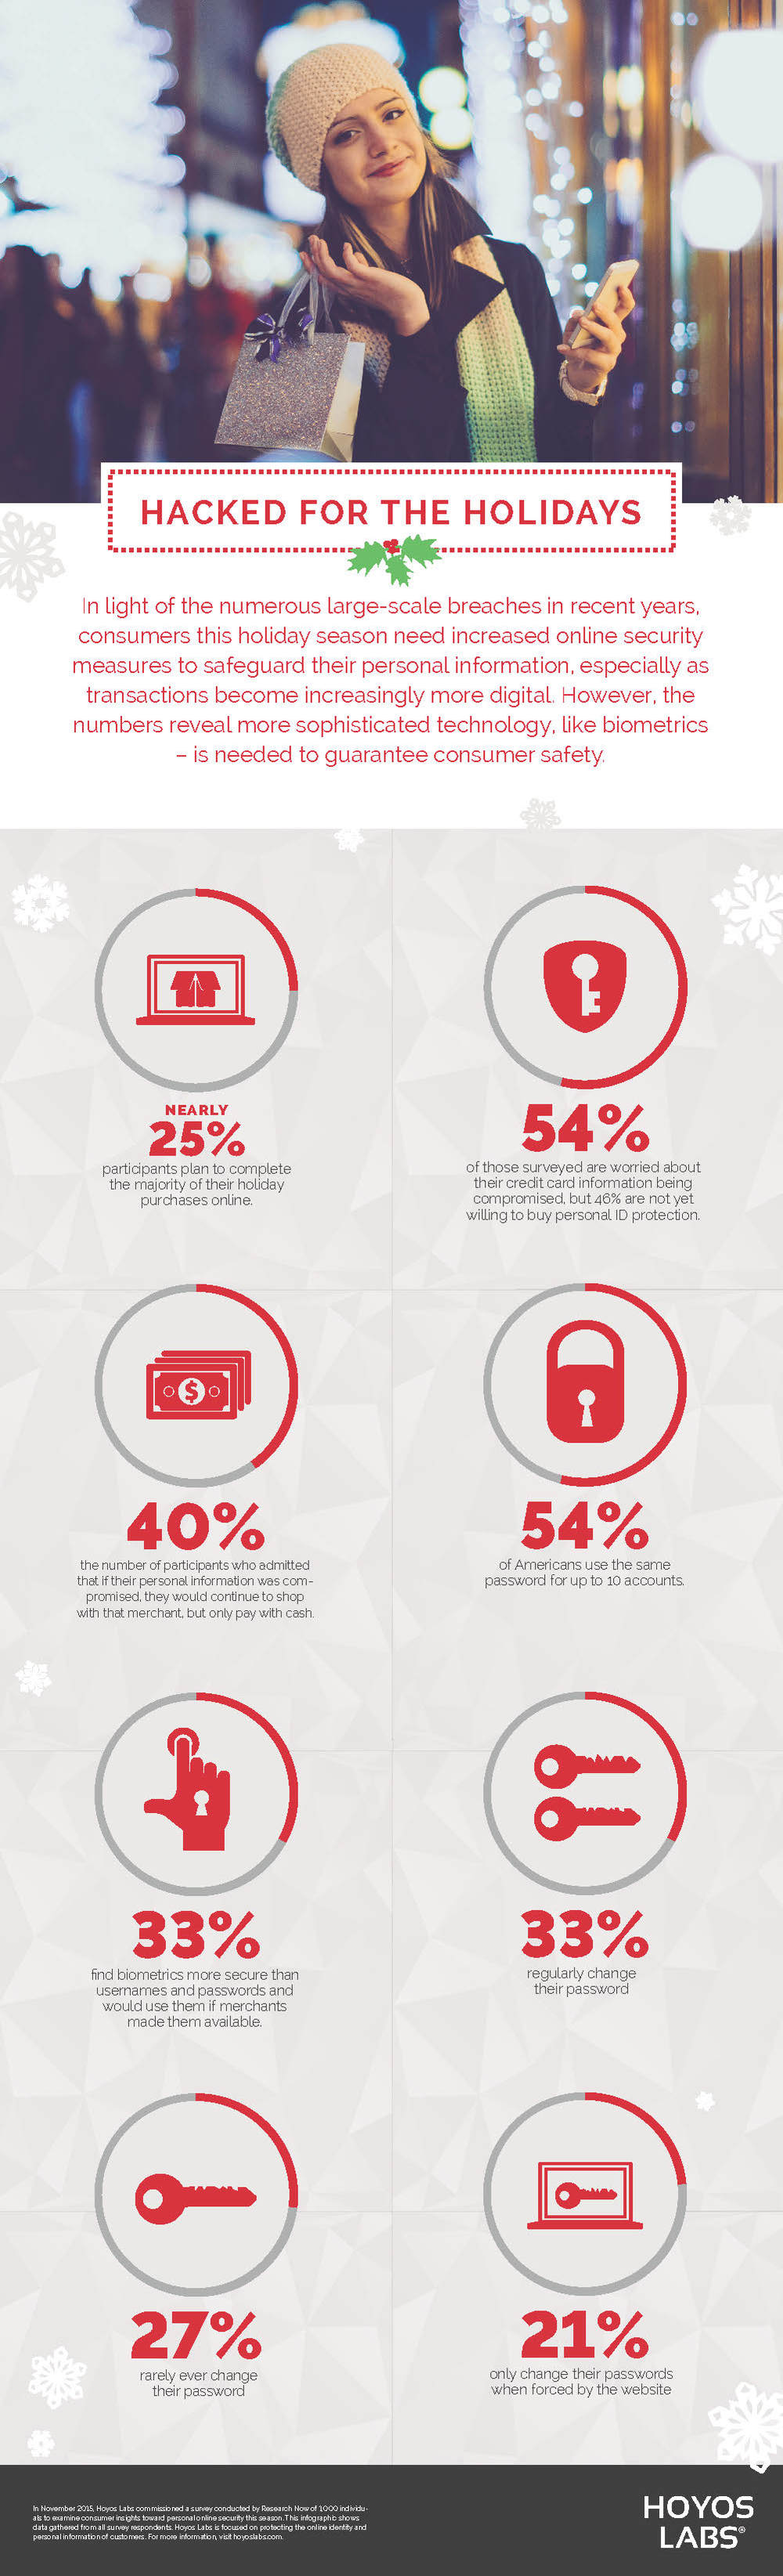 Hoyos_Labs_Infographic.jpg